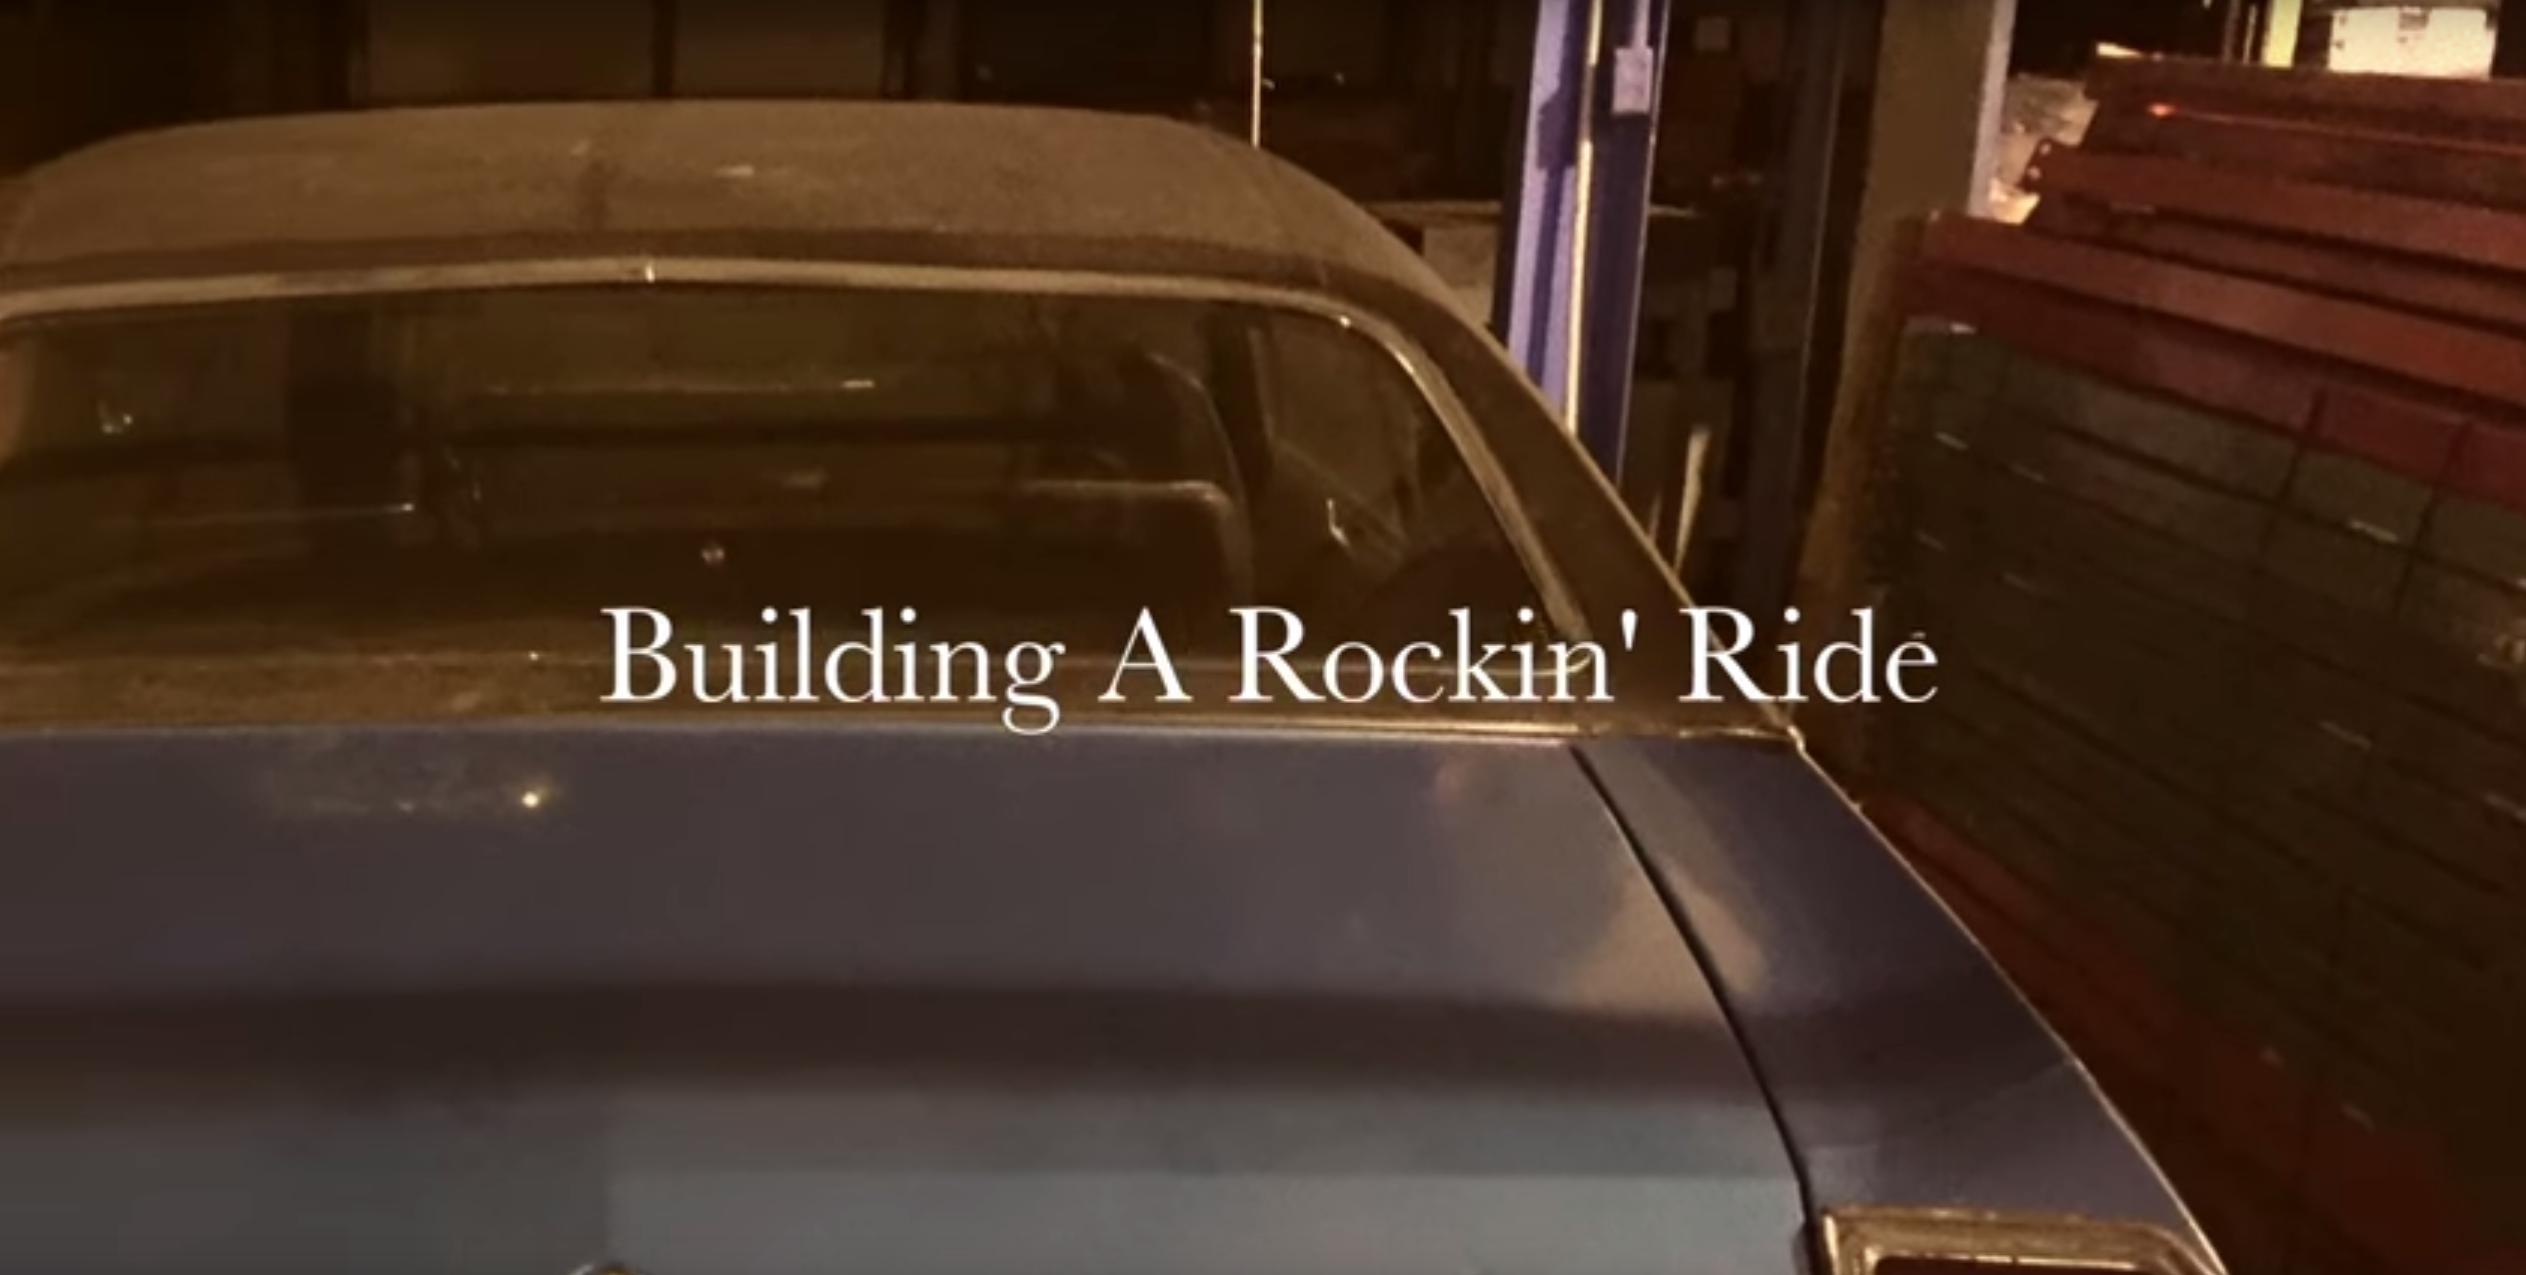 Building A Rockin' Ride